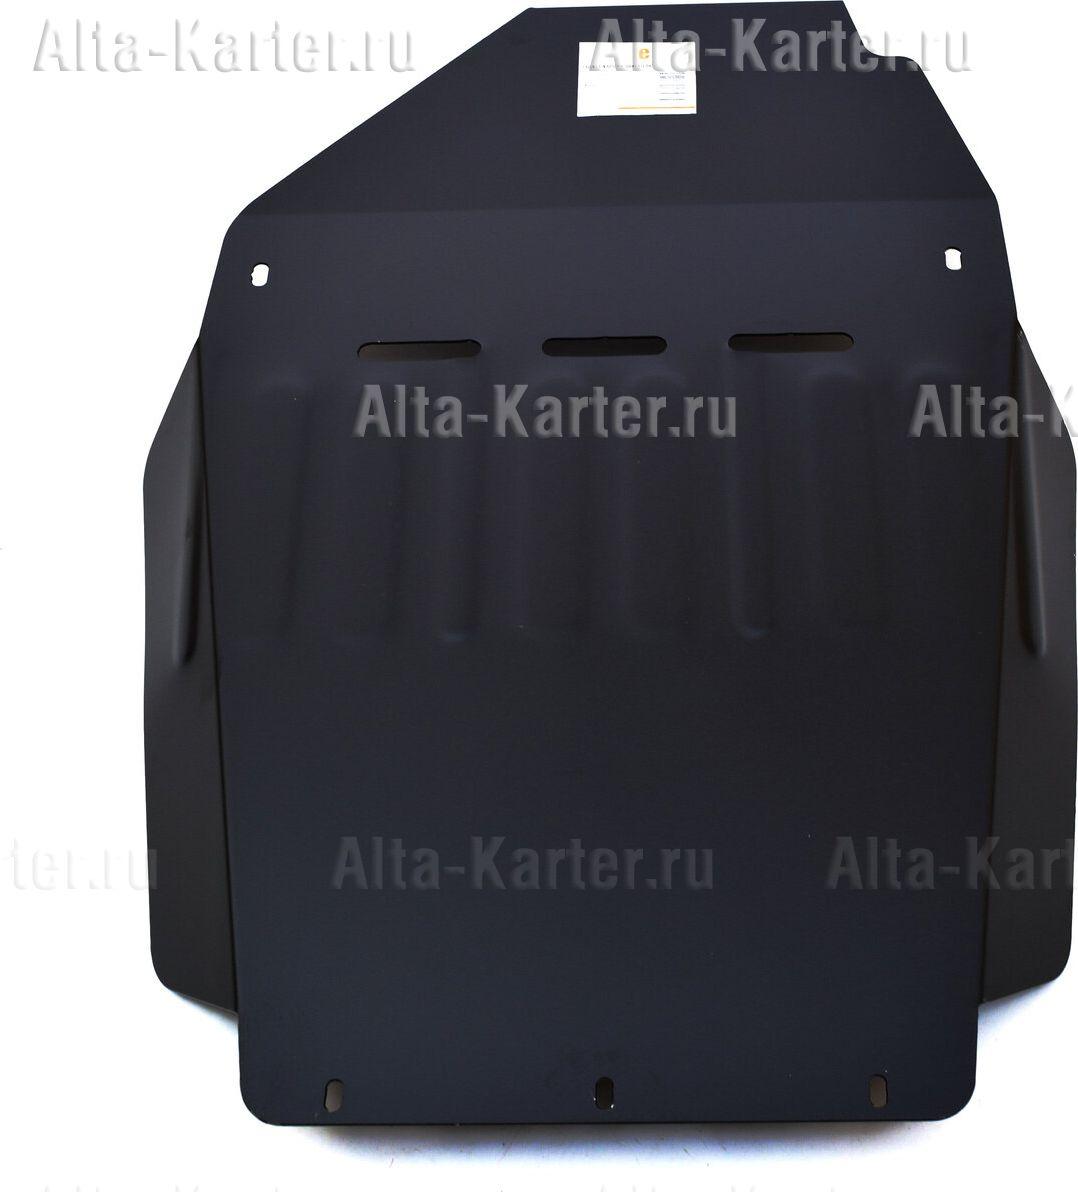 Защита Alfeco для АКПП и РК Toyota Land Cruiser 100 1998-2007. Артикул ALF.24.48